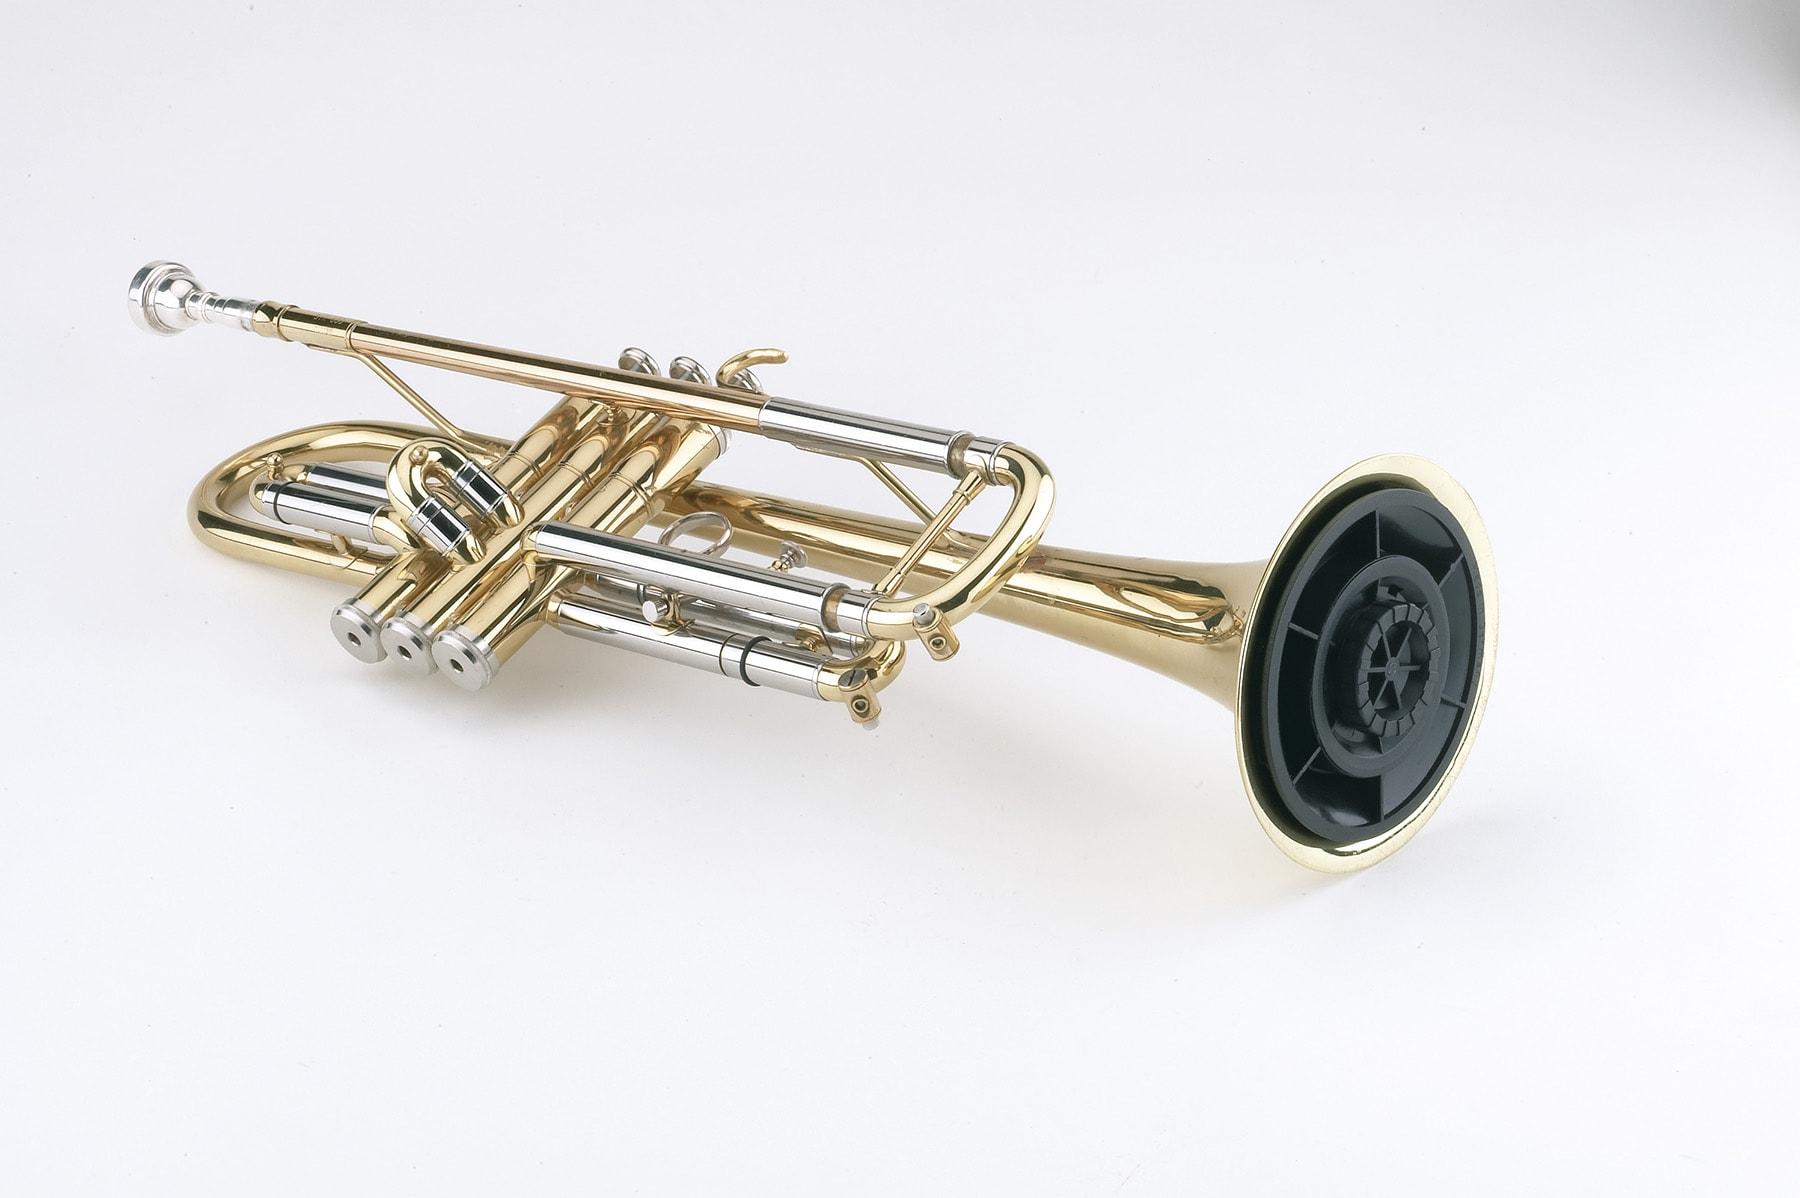 KM152_1 - Trumpet stand